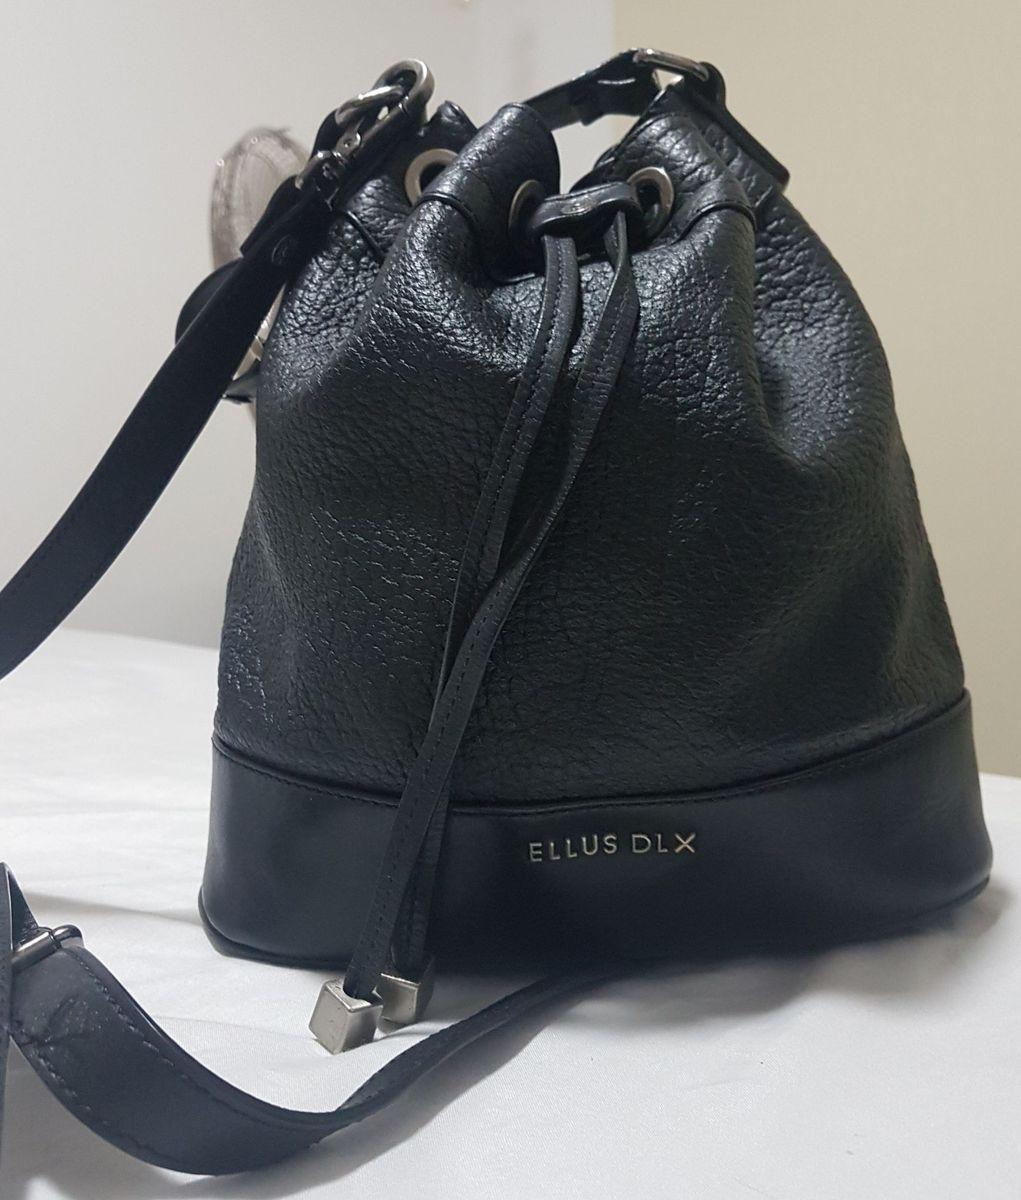 cb6b8afbe bolsa tipo sacola ellus - bolsas ellus.  Czm6ly9wag90b3muzw5qb2vplmnvbs5ici9wcm9kdwn0cy8ymja1odmvmjhiyjyzmdninmezytc1otk4mgm1otg0ndcyymvhzwquanbn